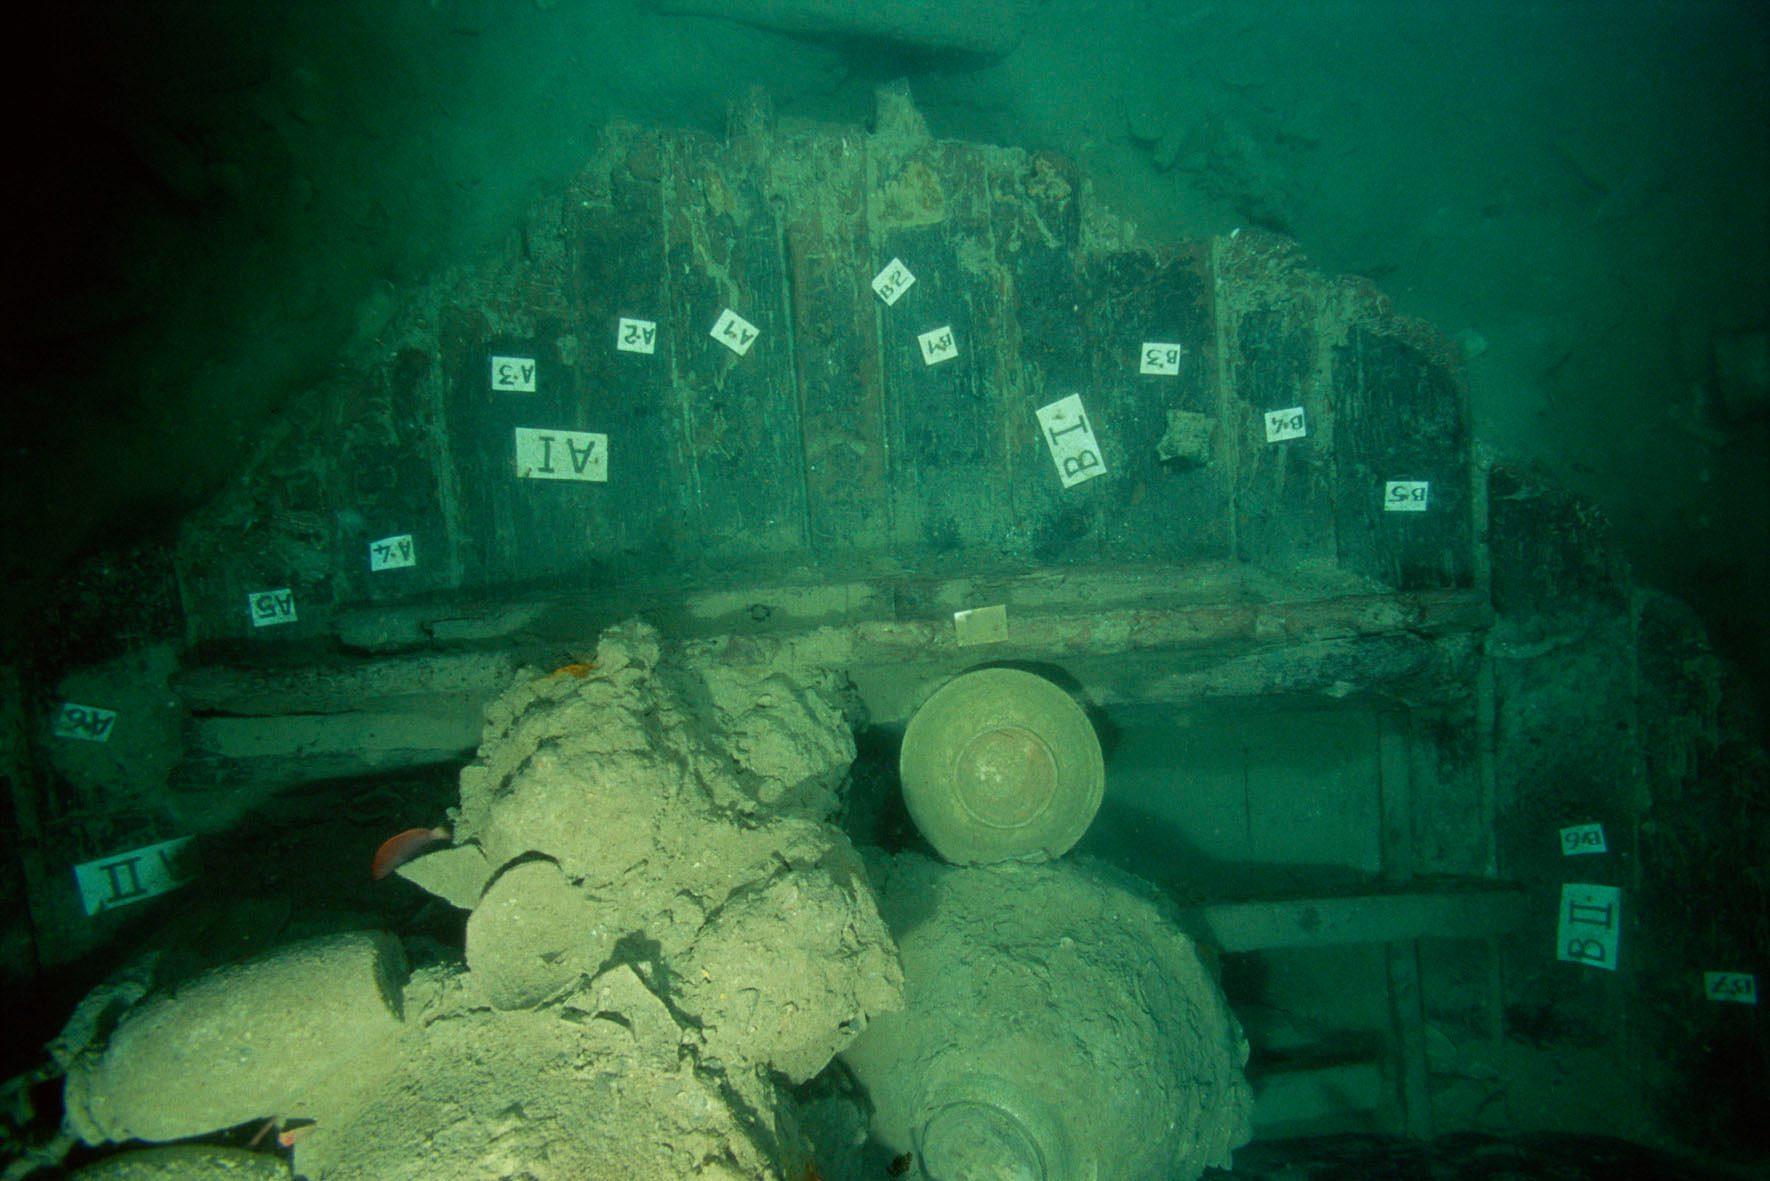 Santa Cruz shipwreck in Santa Cruz Municipality, Zambales Province